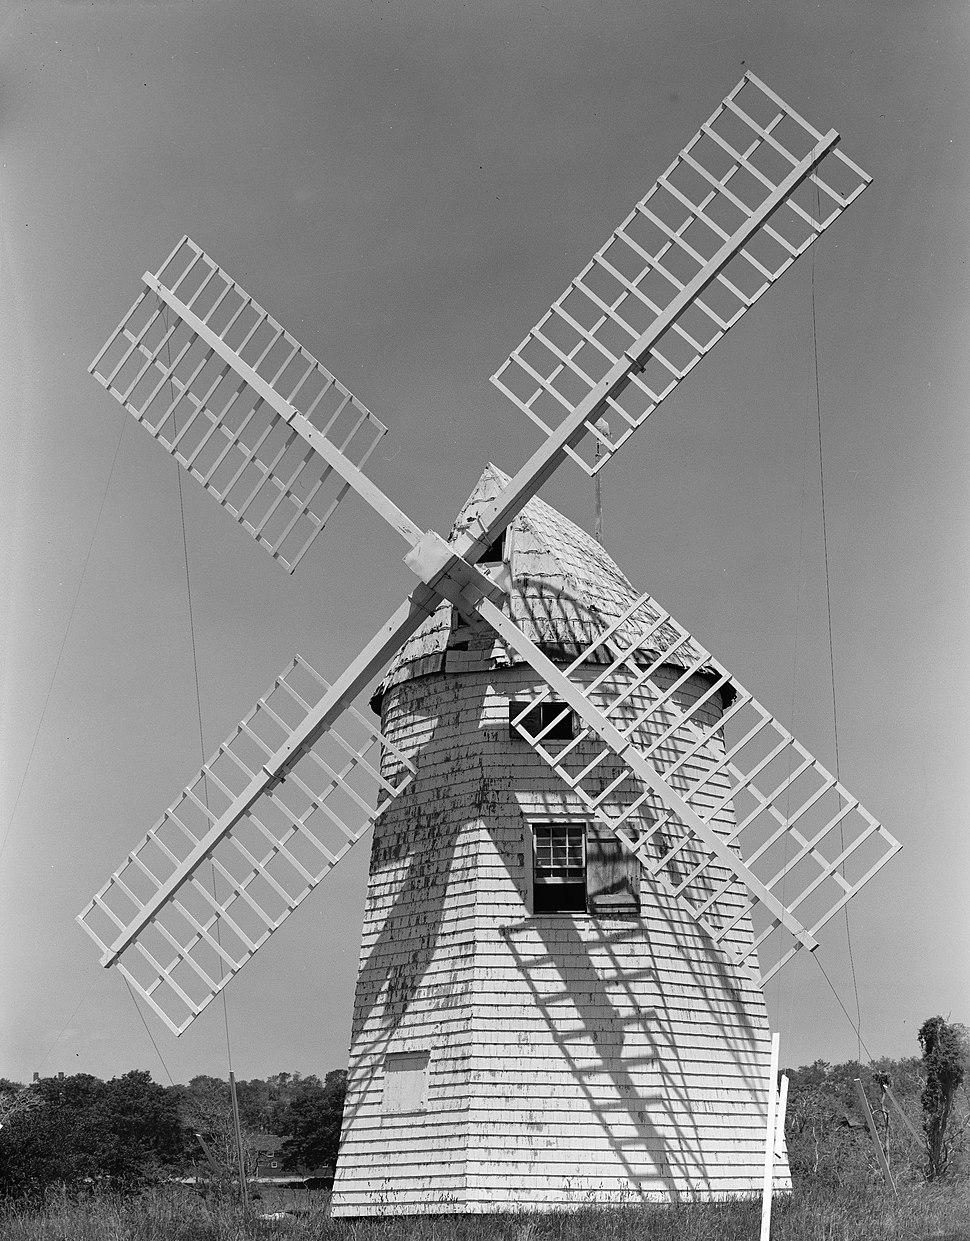 Gardiners Island Windmill